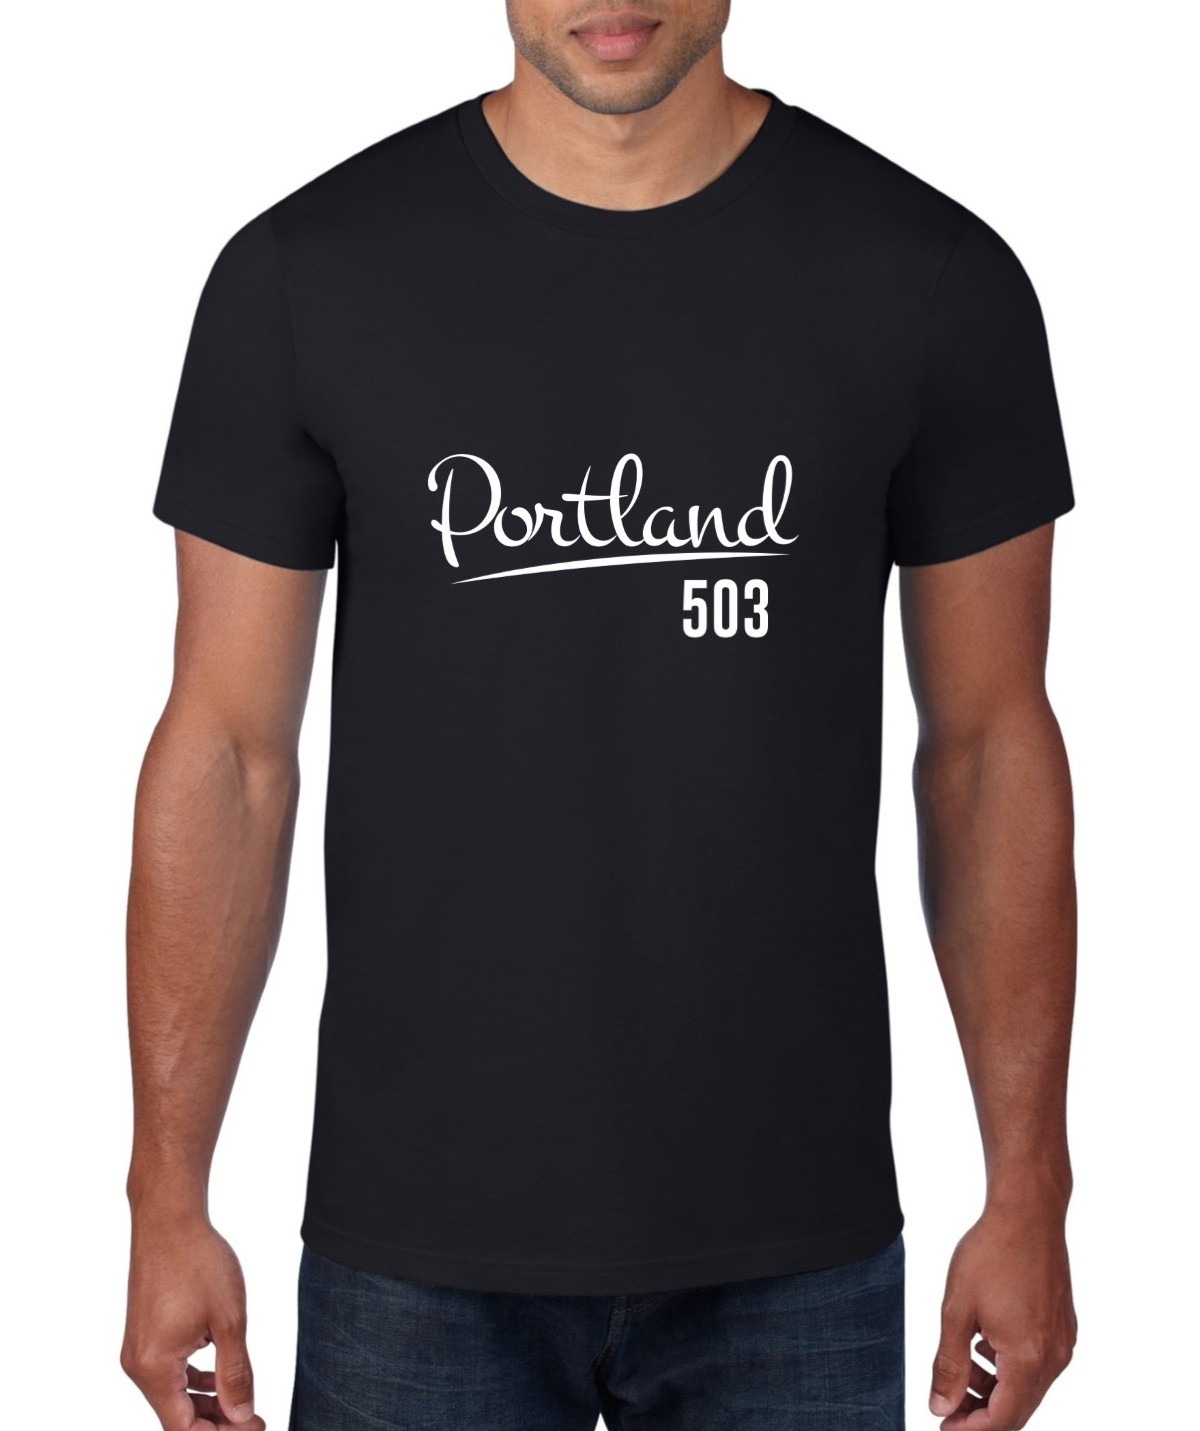 Portland 503 - T Shirt